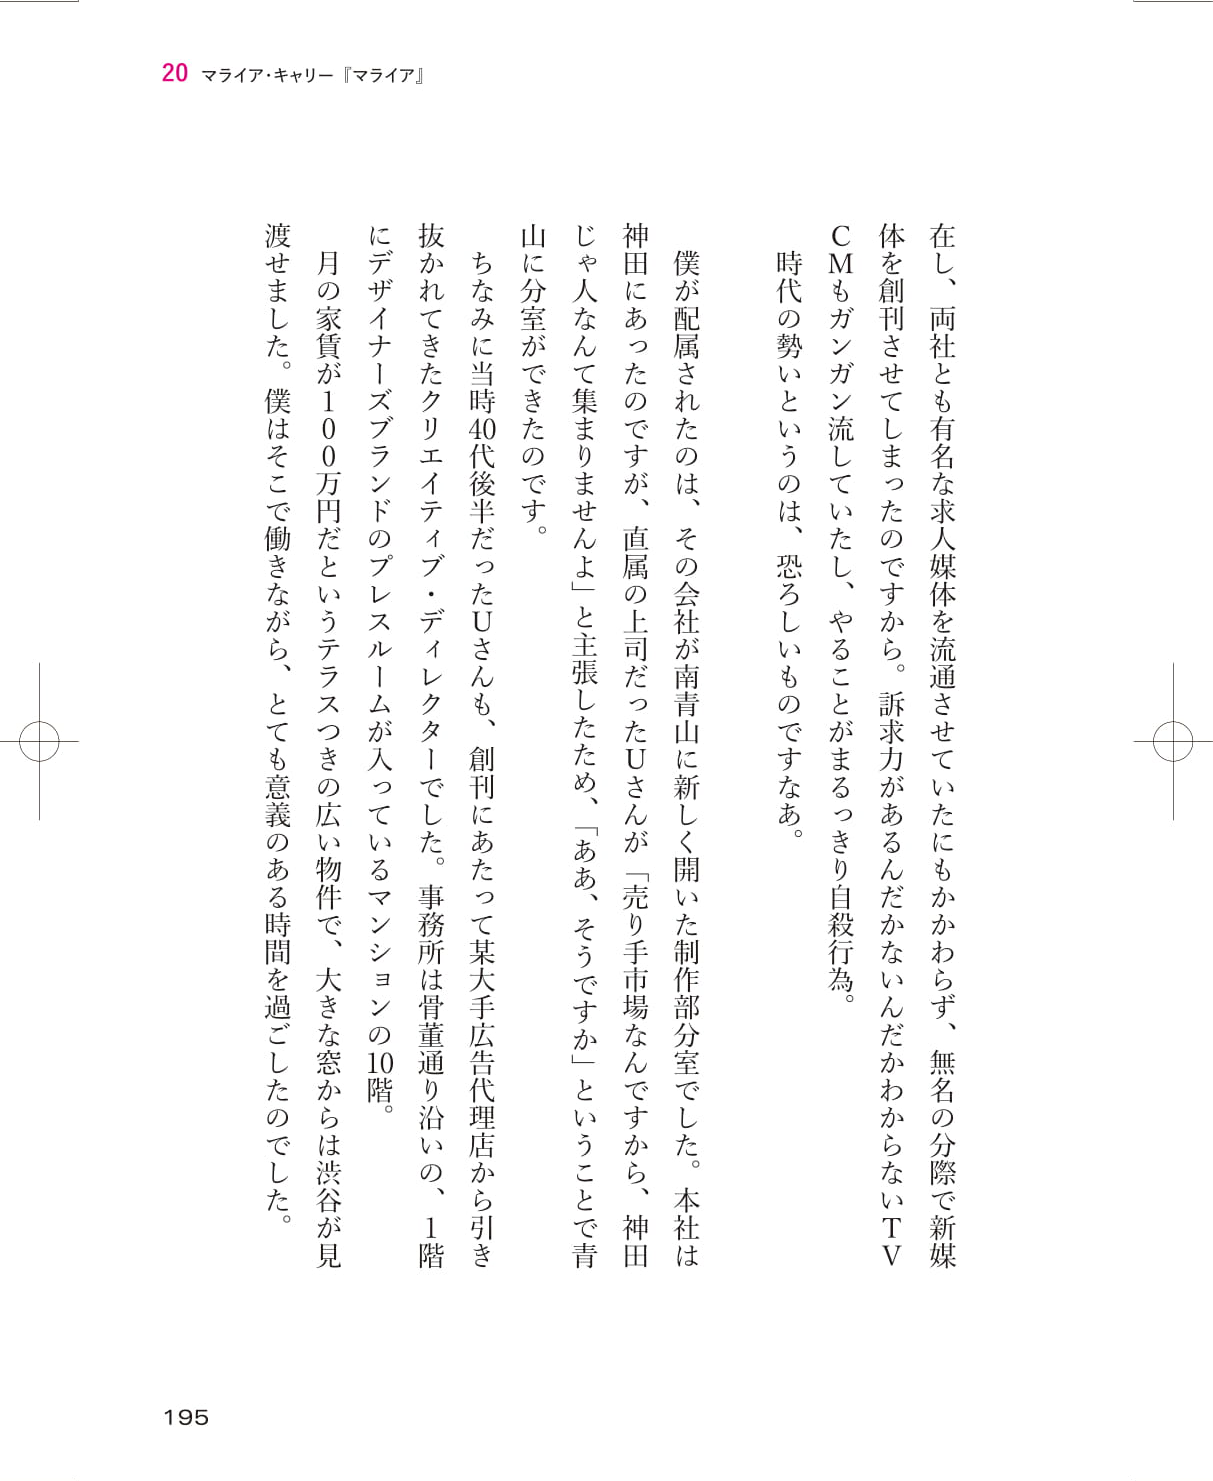 lh_ongakunokioku_MariahCarey-02